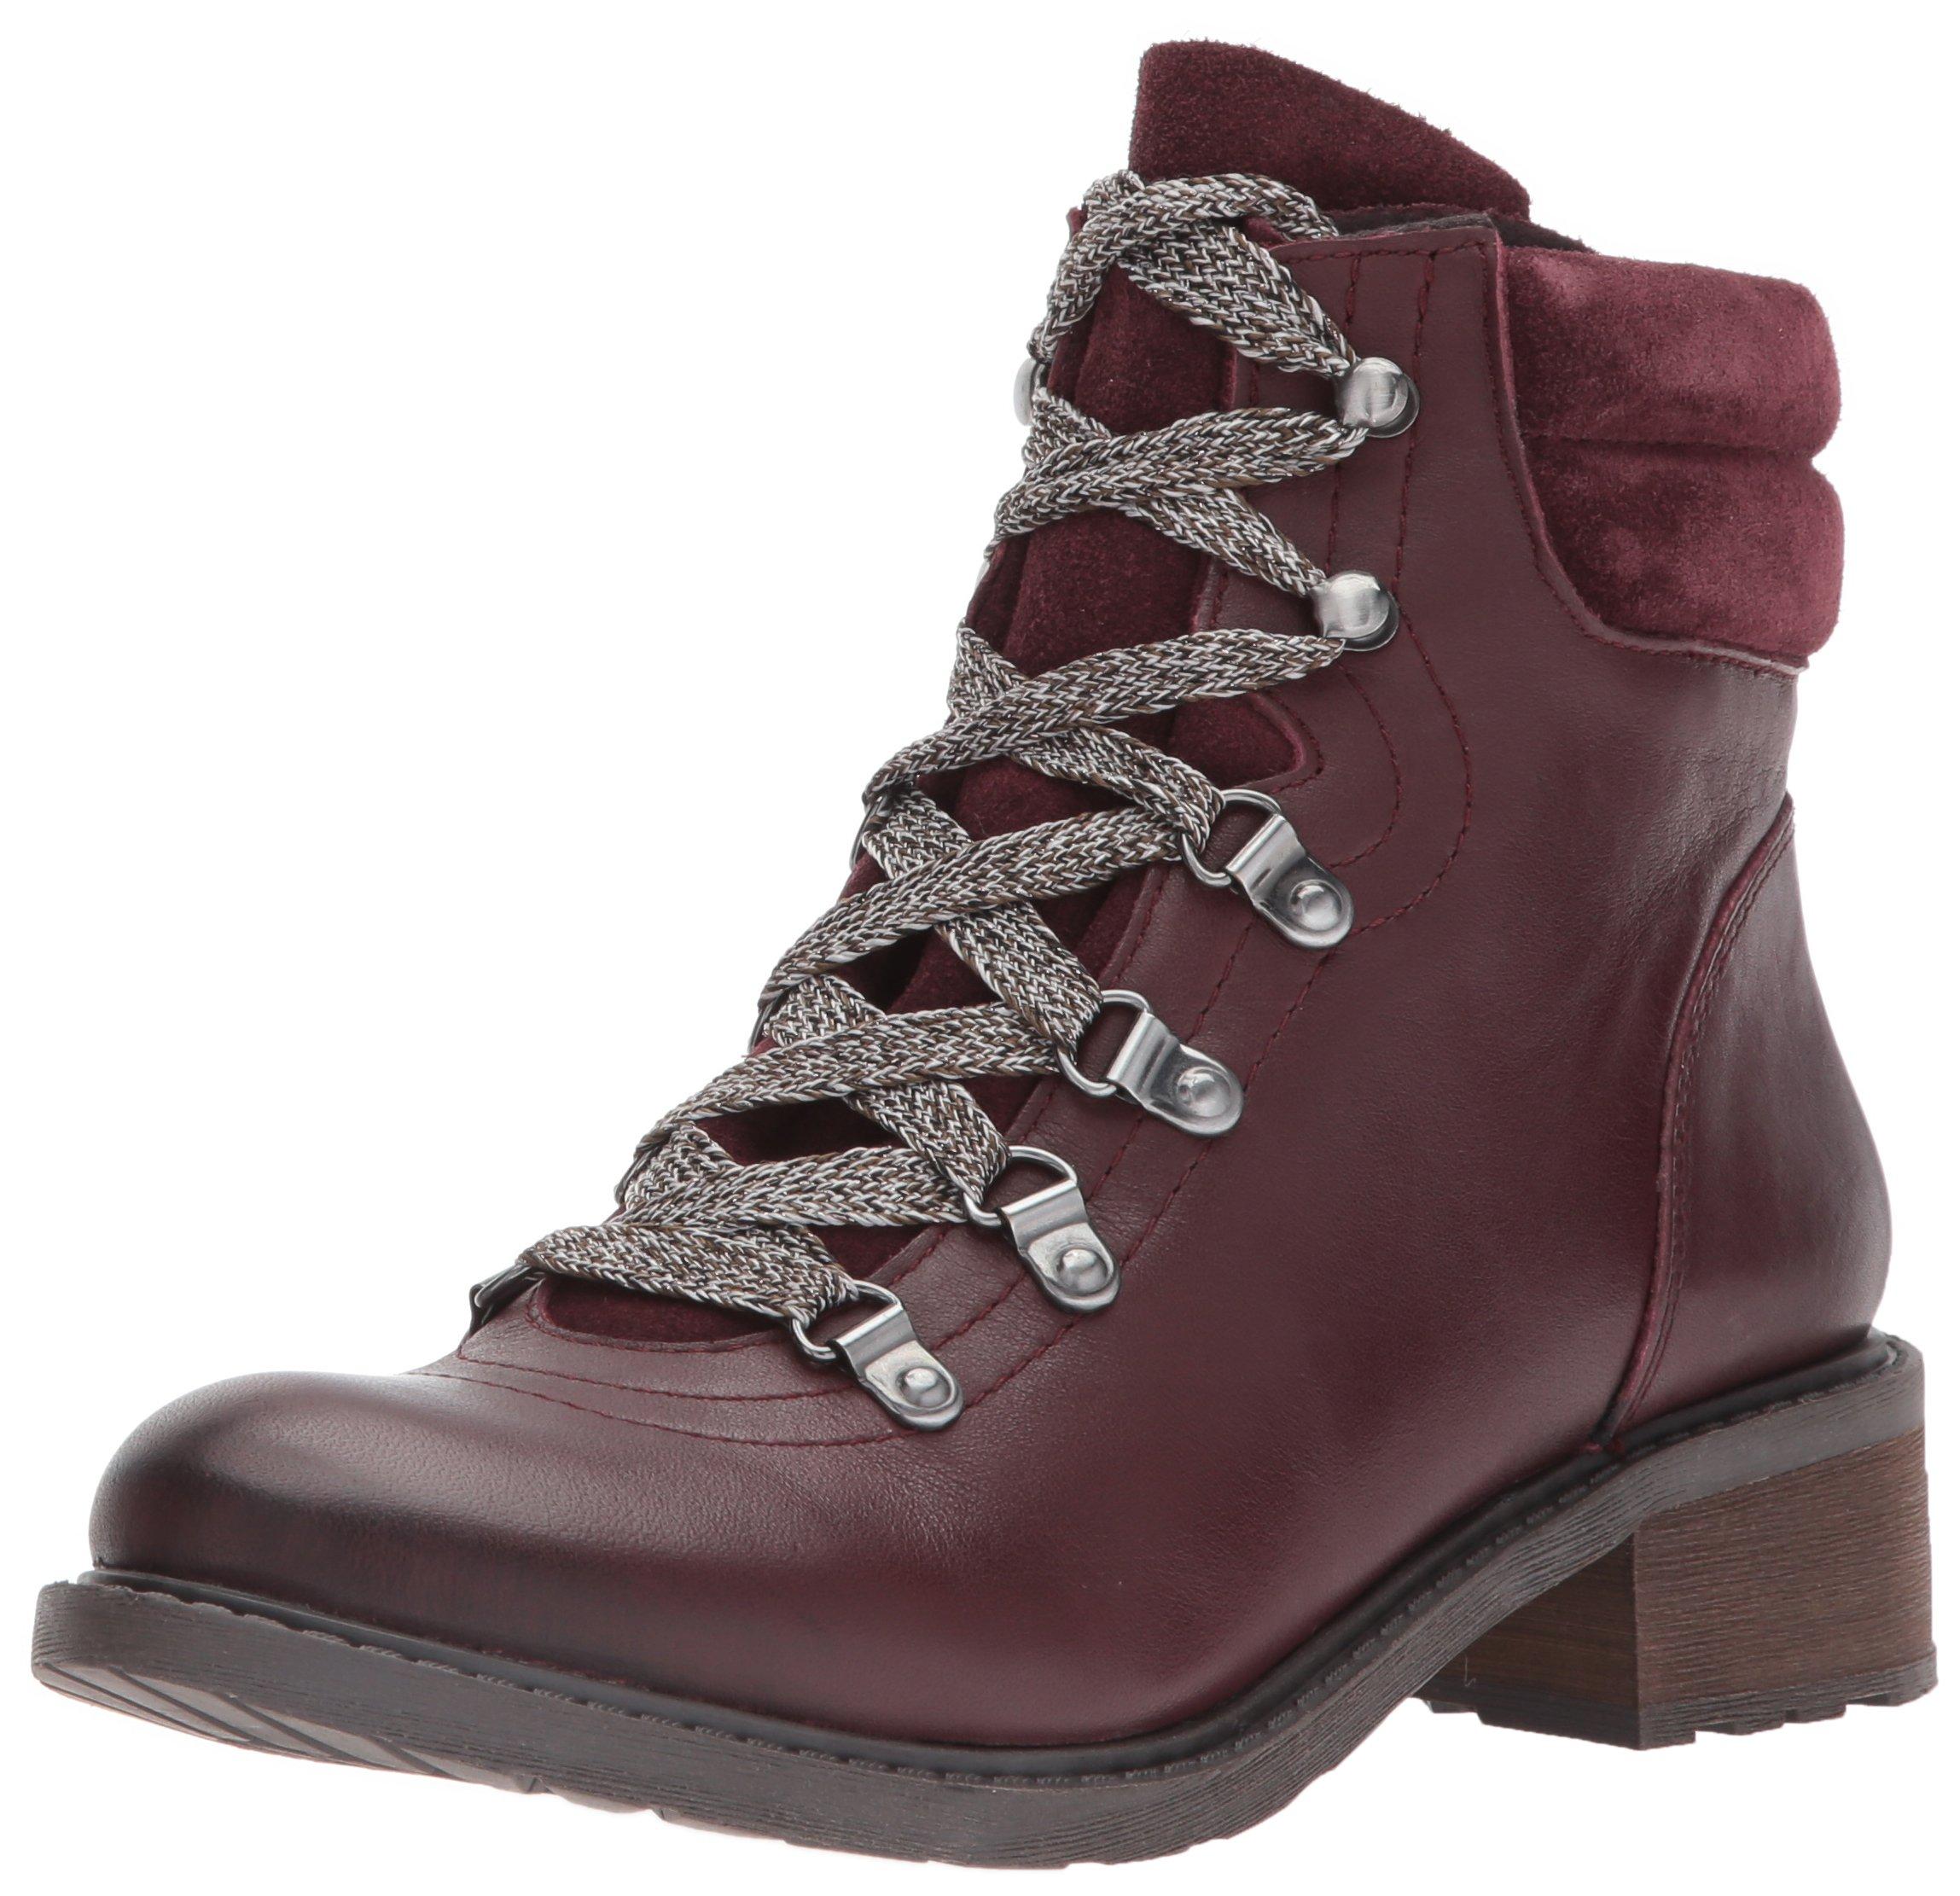 Sam Edelman Women's Darrah Ankle Boot, Malbec, 10.5 Medium US